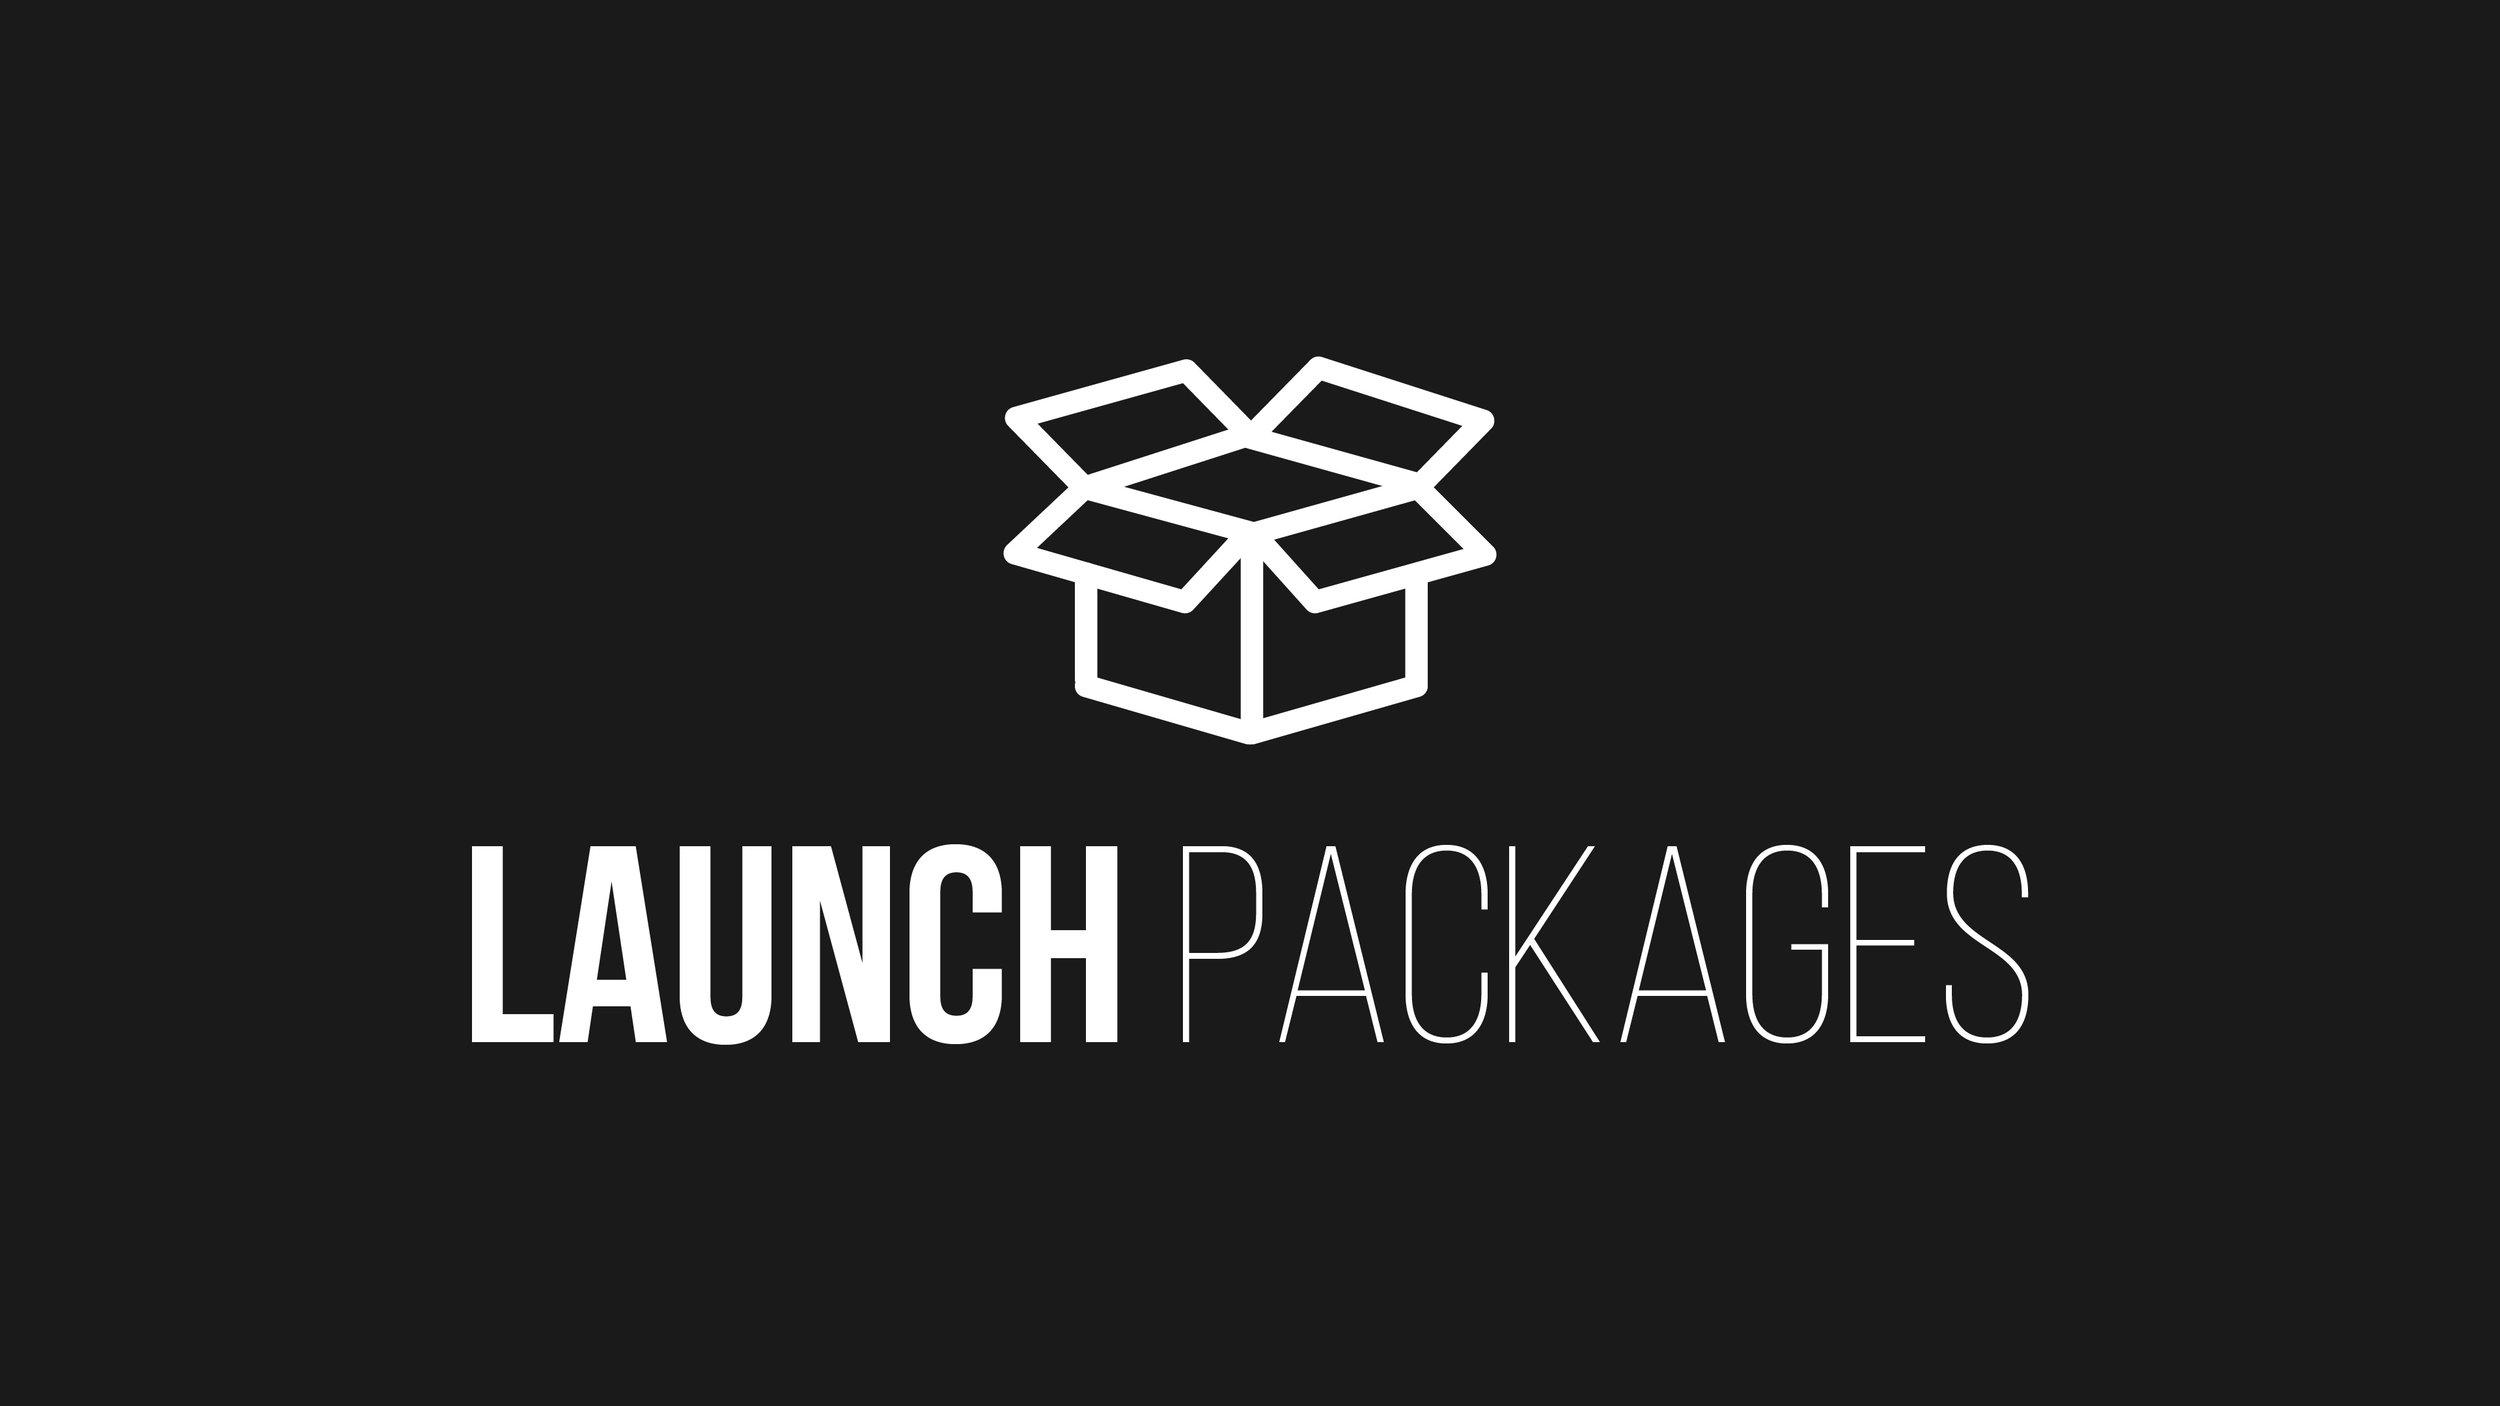 SC Assets v1.1_Launch Packages.jpg